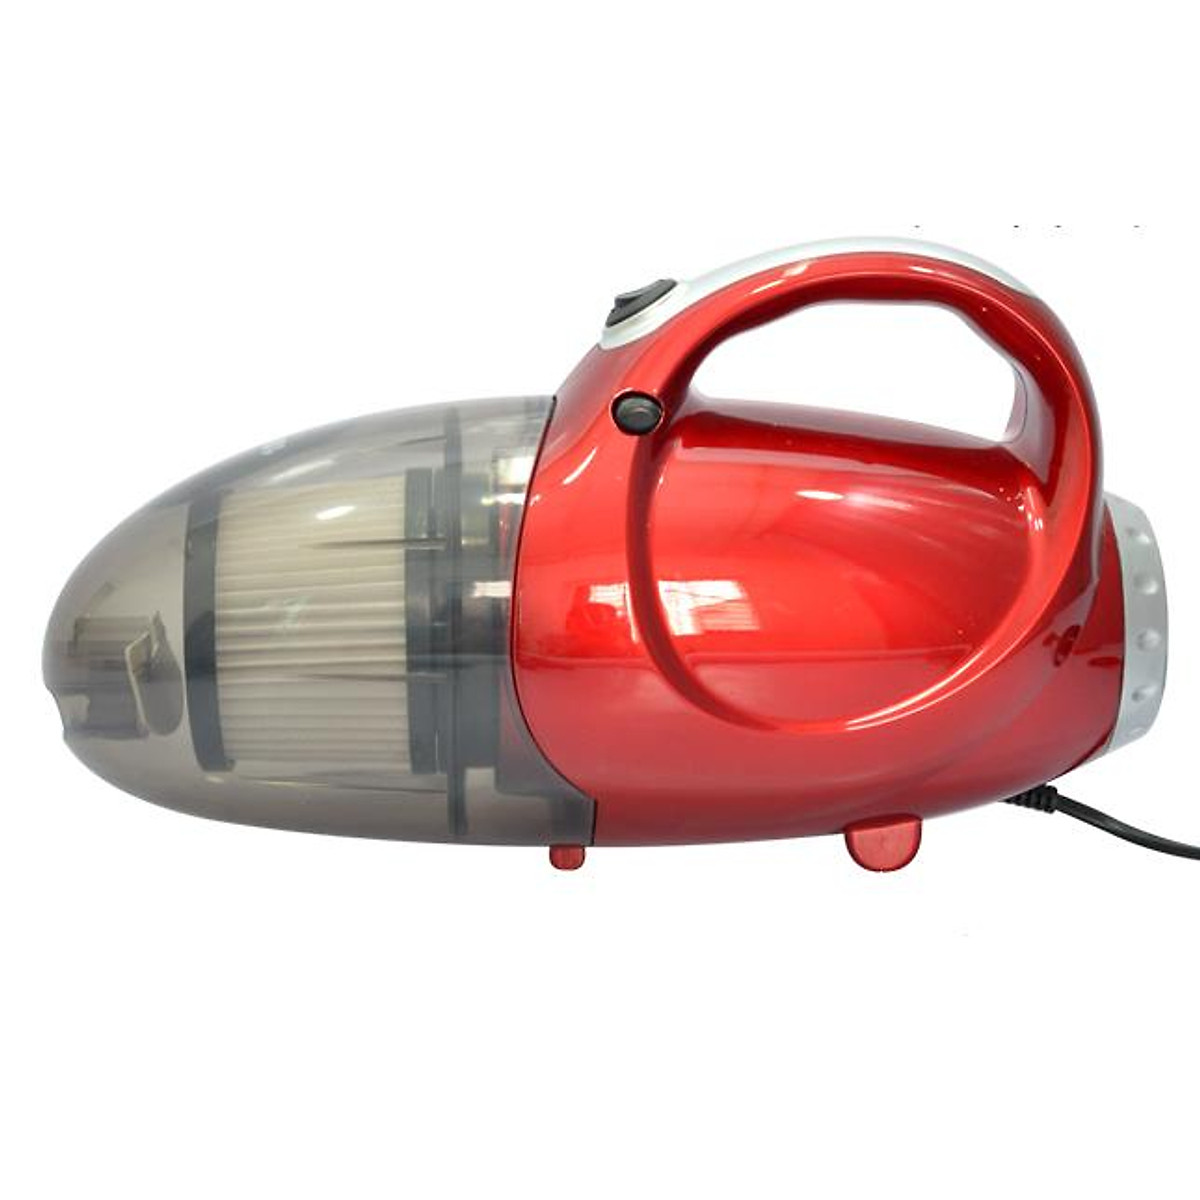 Máy Hút Bụi Cầm Tay 1000W (Đỏ)